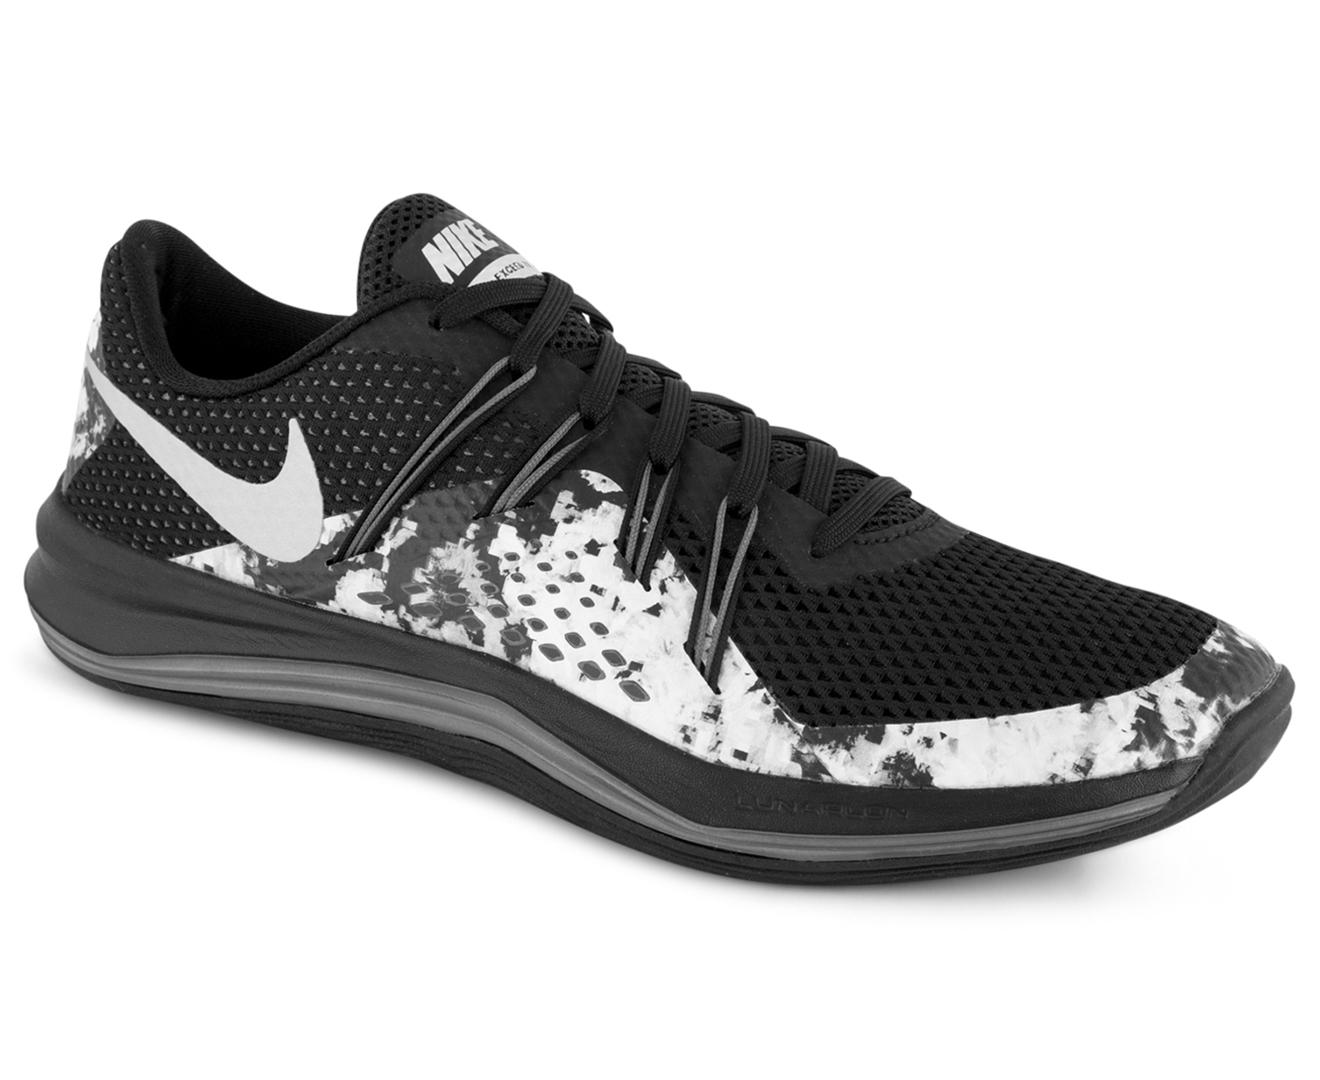 08845a67747c Nike Women s Lunar Exceed TR Print Shoe - Black Metallic Silver ...